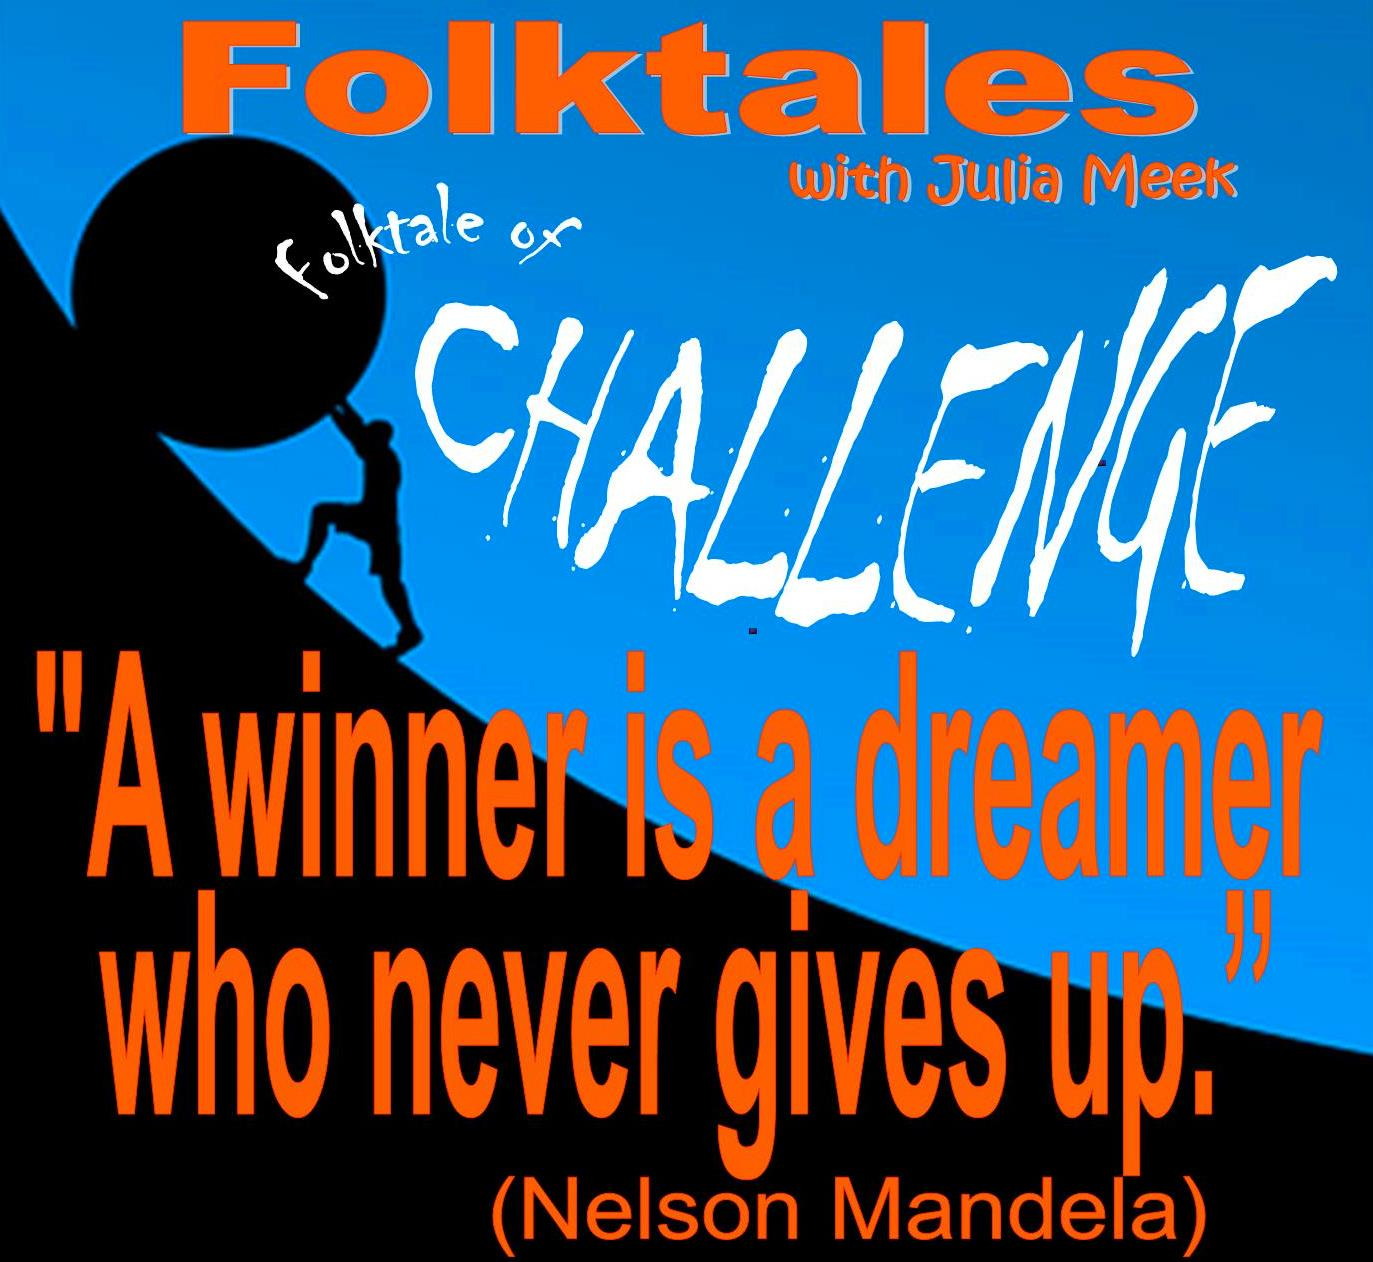 Caption: WBOI's Folktale of Challenge, Credit: Julia Meek